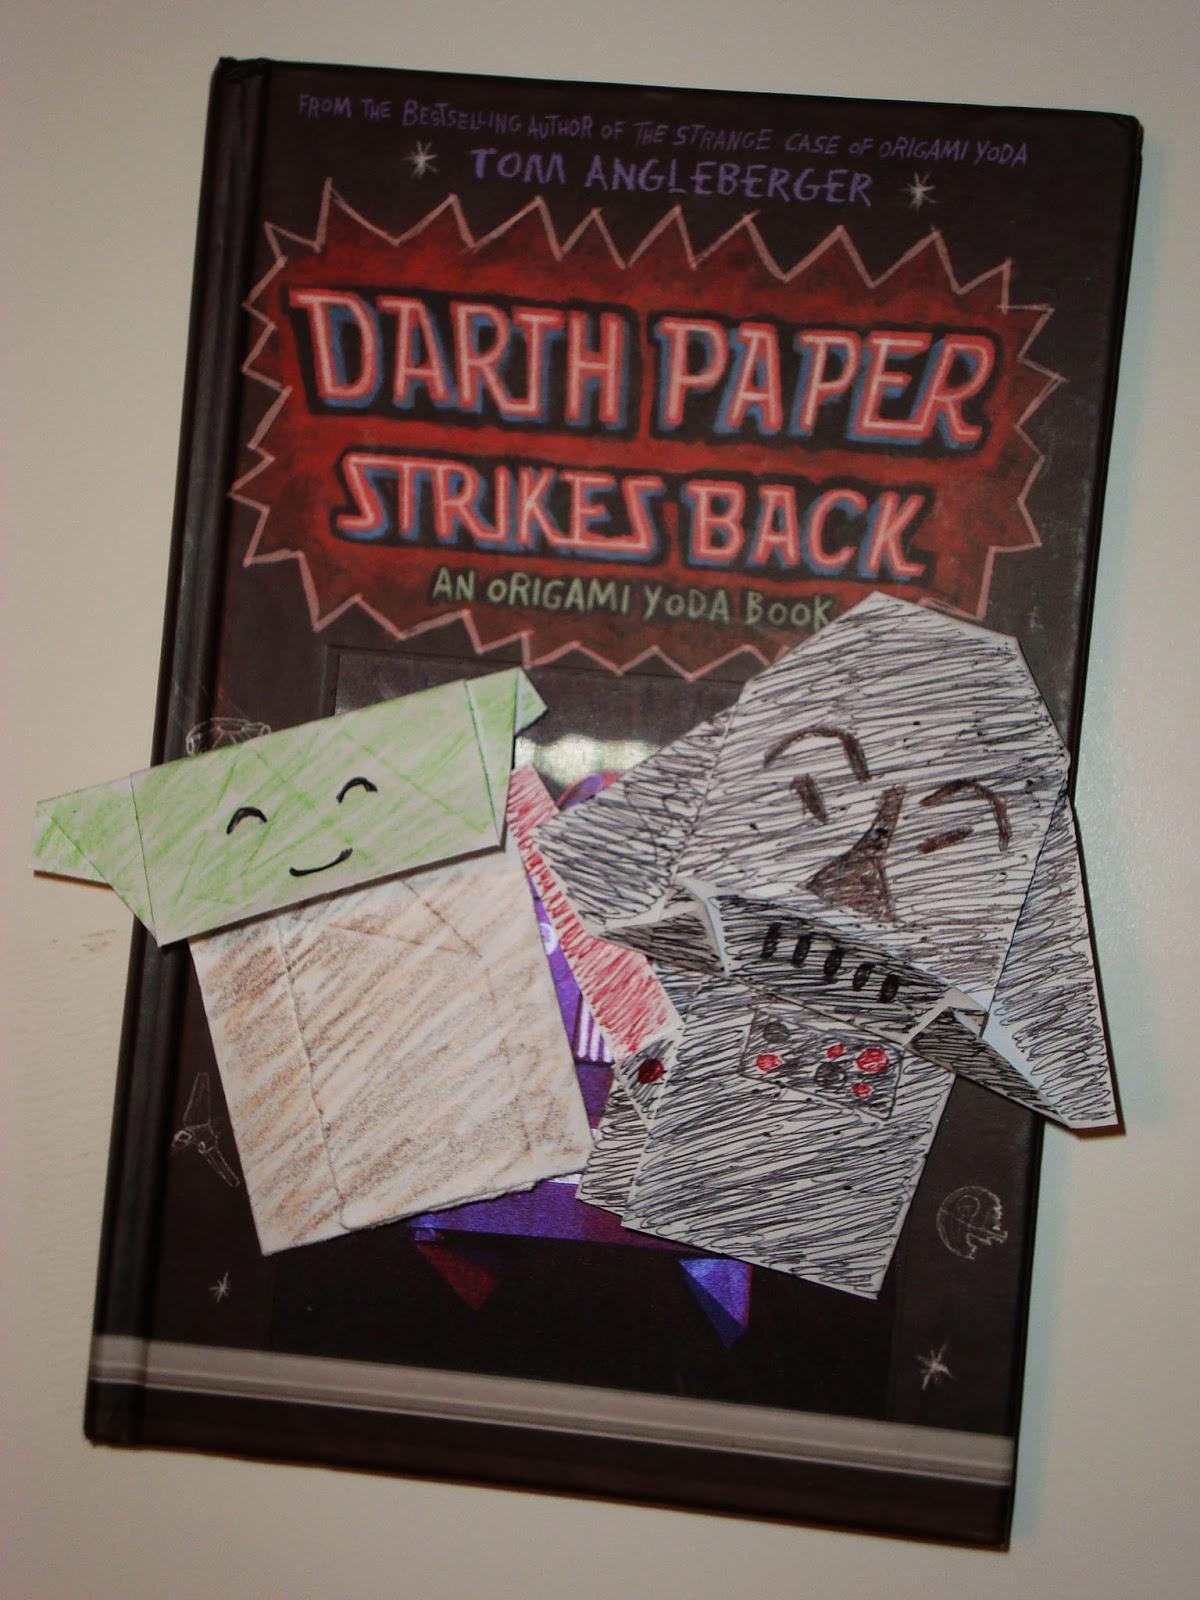 darth paper strikes back Who wrote darth paper strikes back - answerscom  pie.